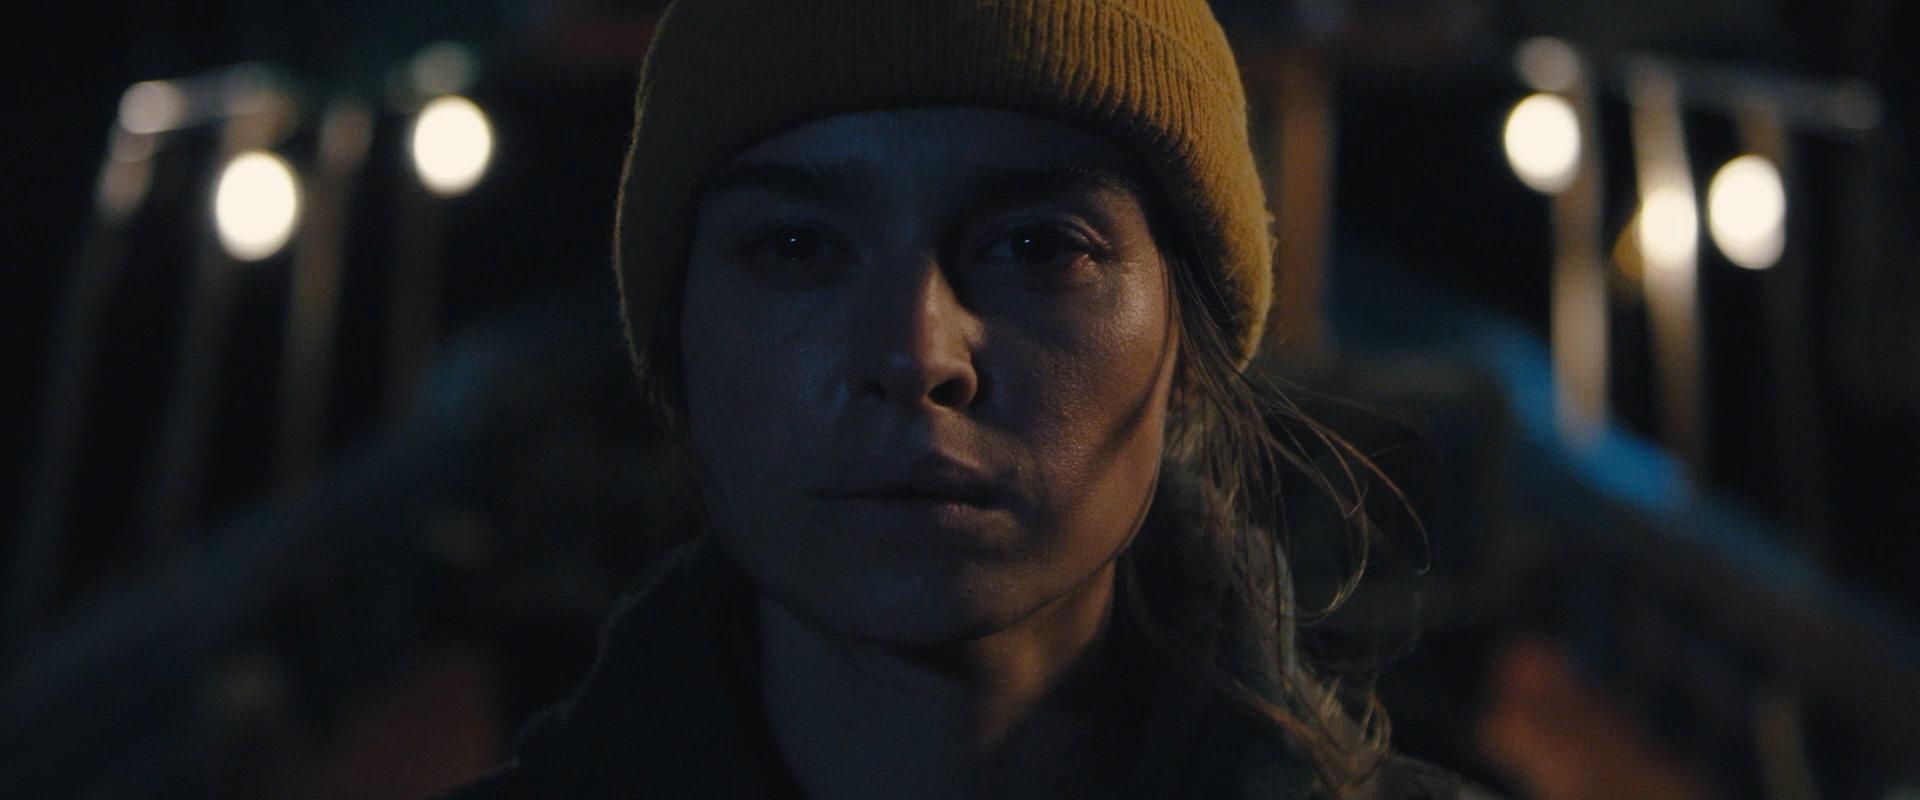 mobydick-oz-film-3